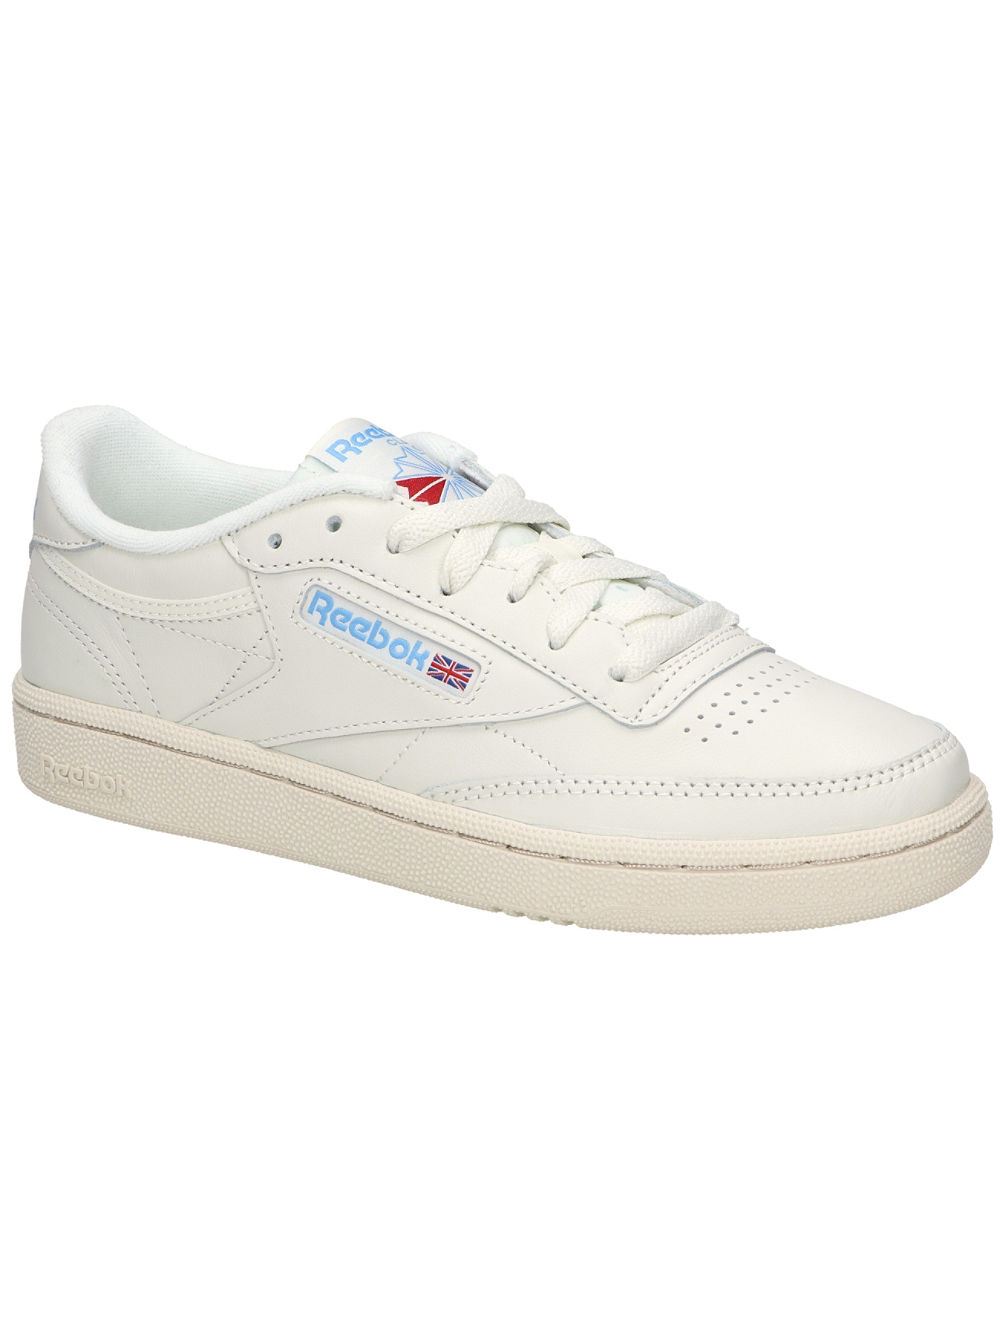 5718cef15d481 Buy Reebok Club C 85 Sneakers online at Blue Tomato